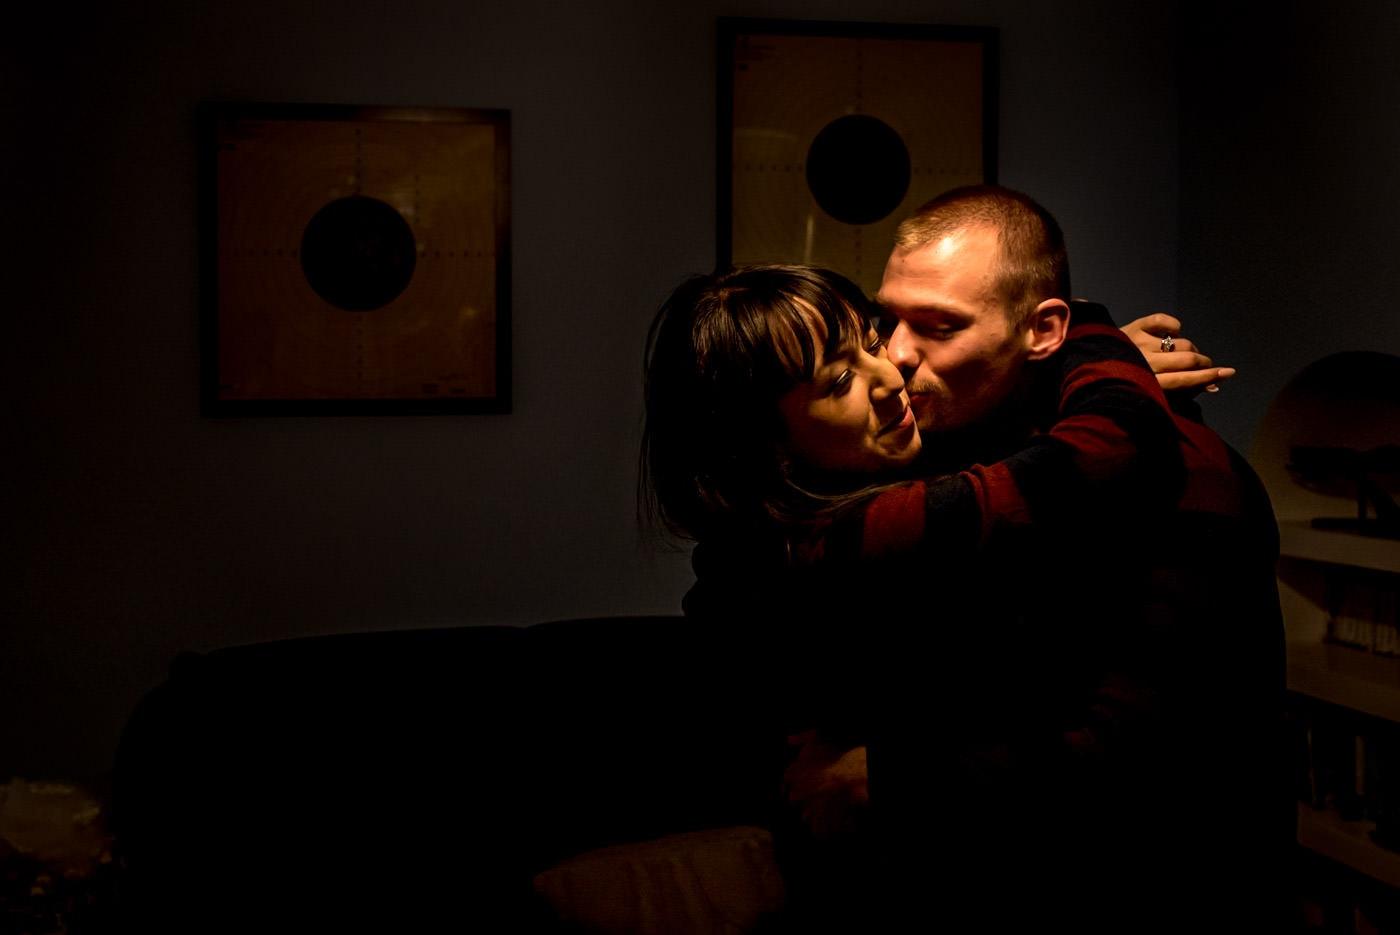 bride and groom kissing in their matching onsies